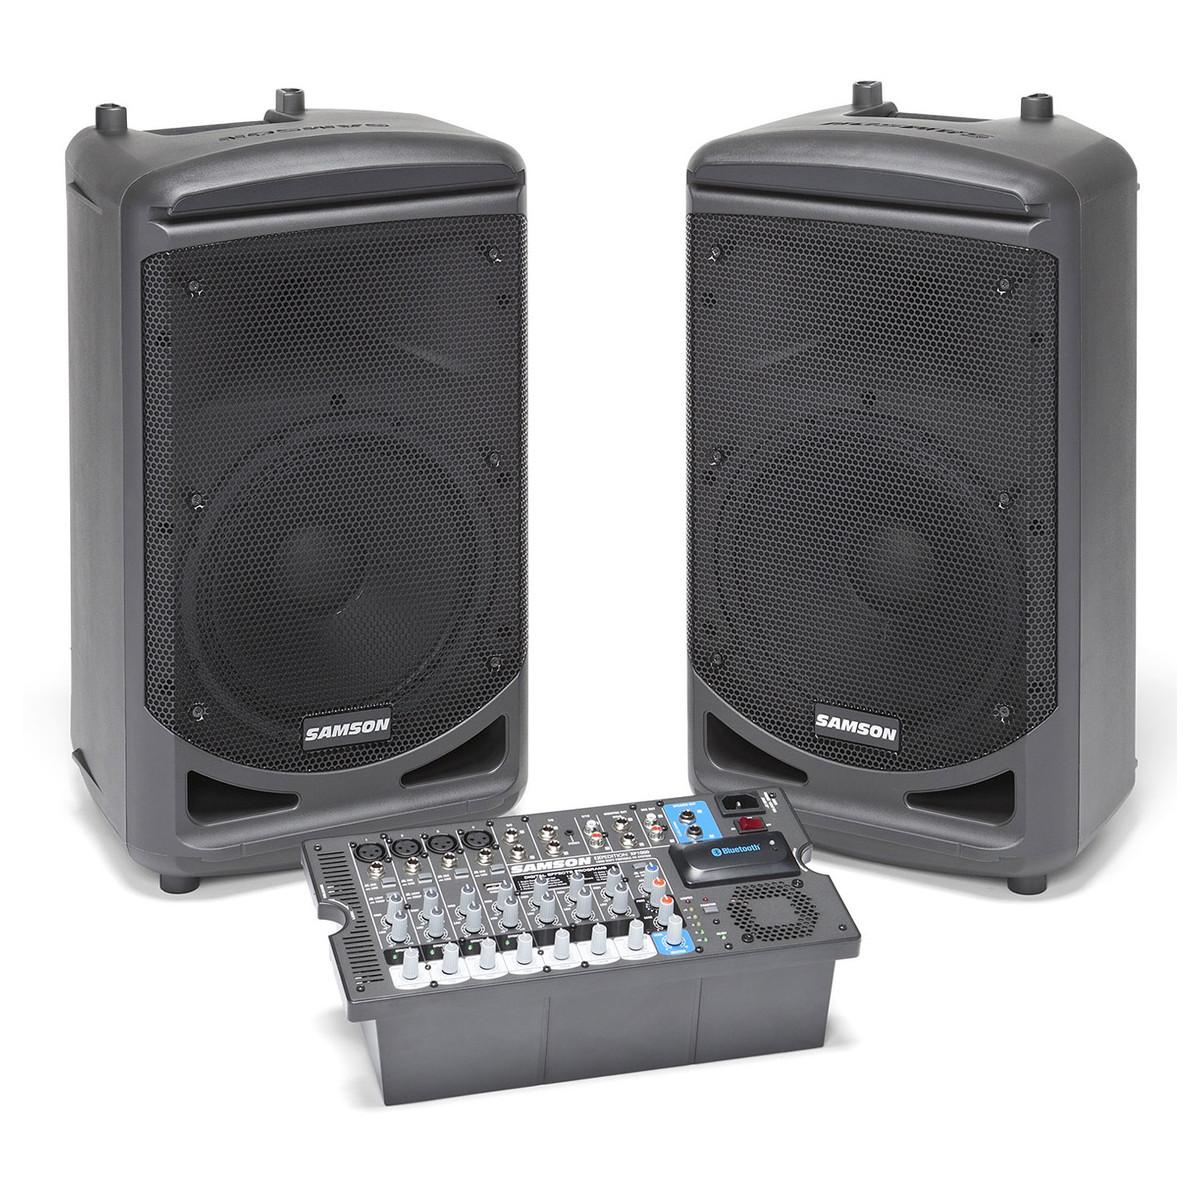 Samson PA XP1000B mit Bluetooth bei Gear4music